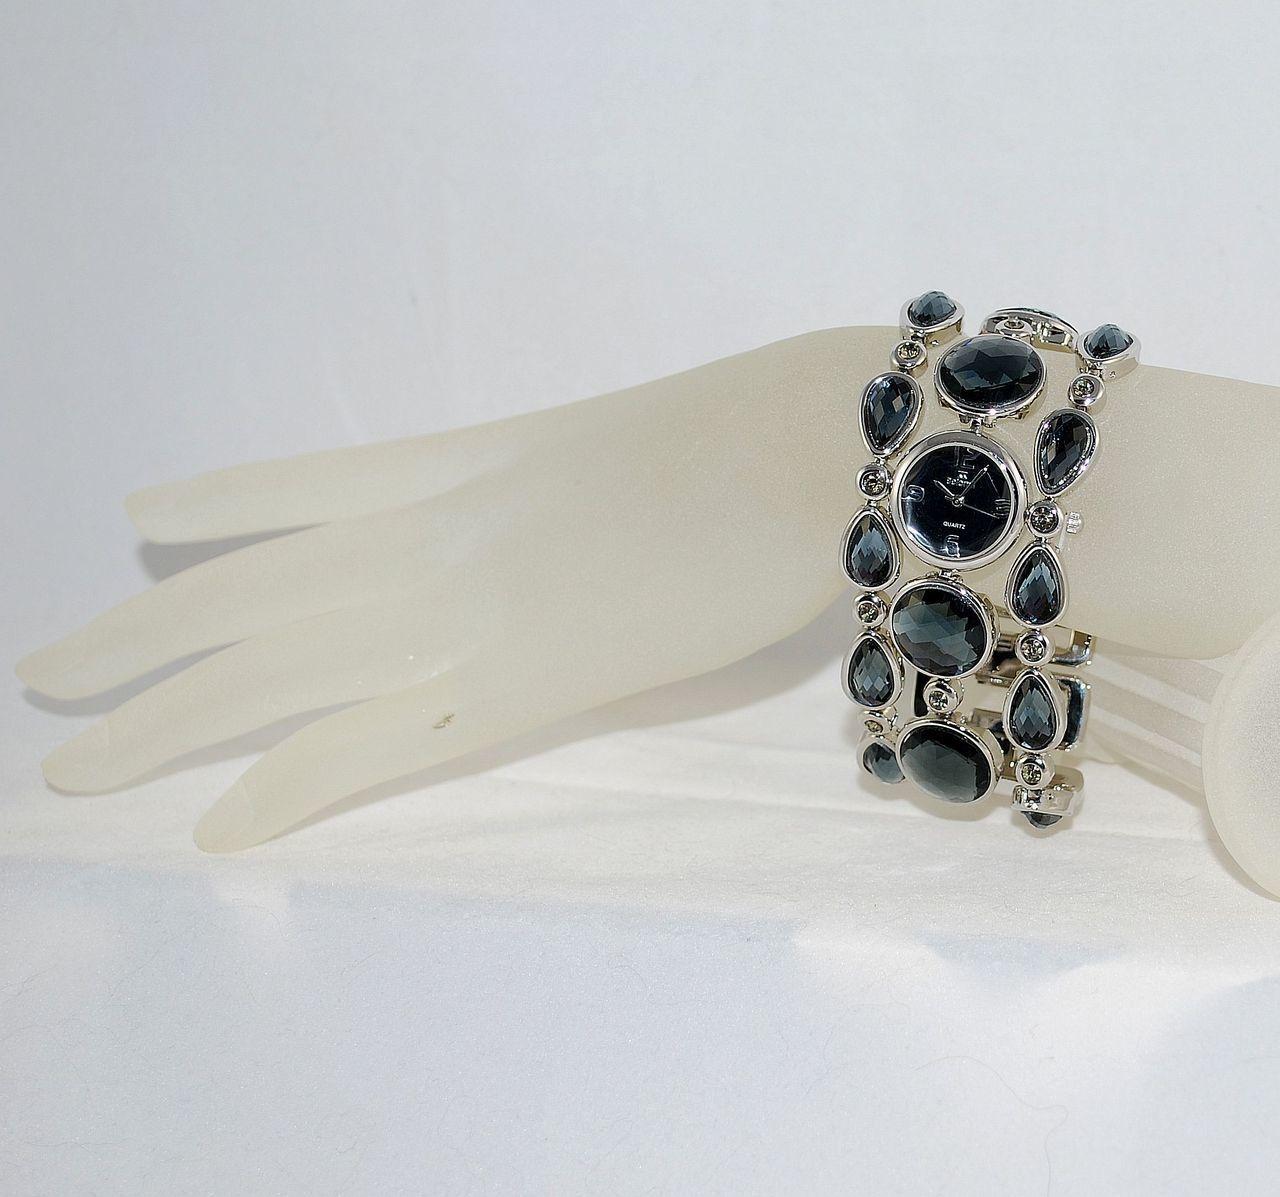 Enchanting Jewelry Creations image 27